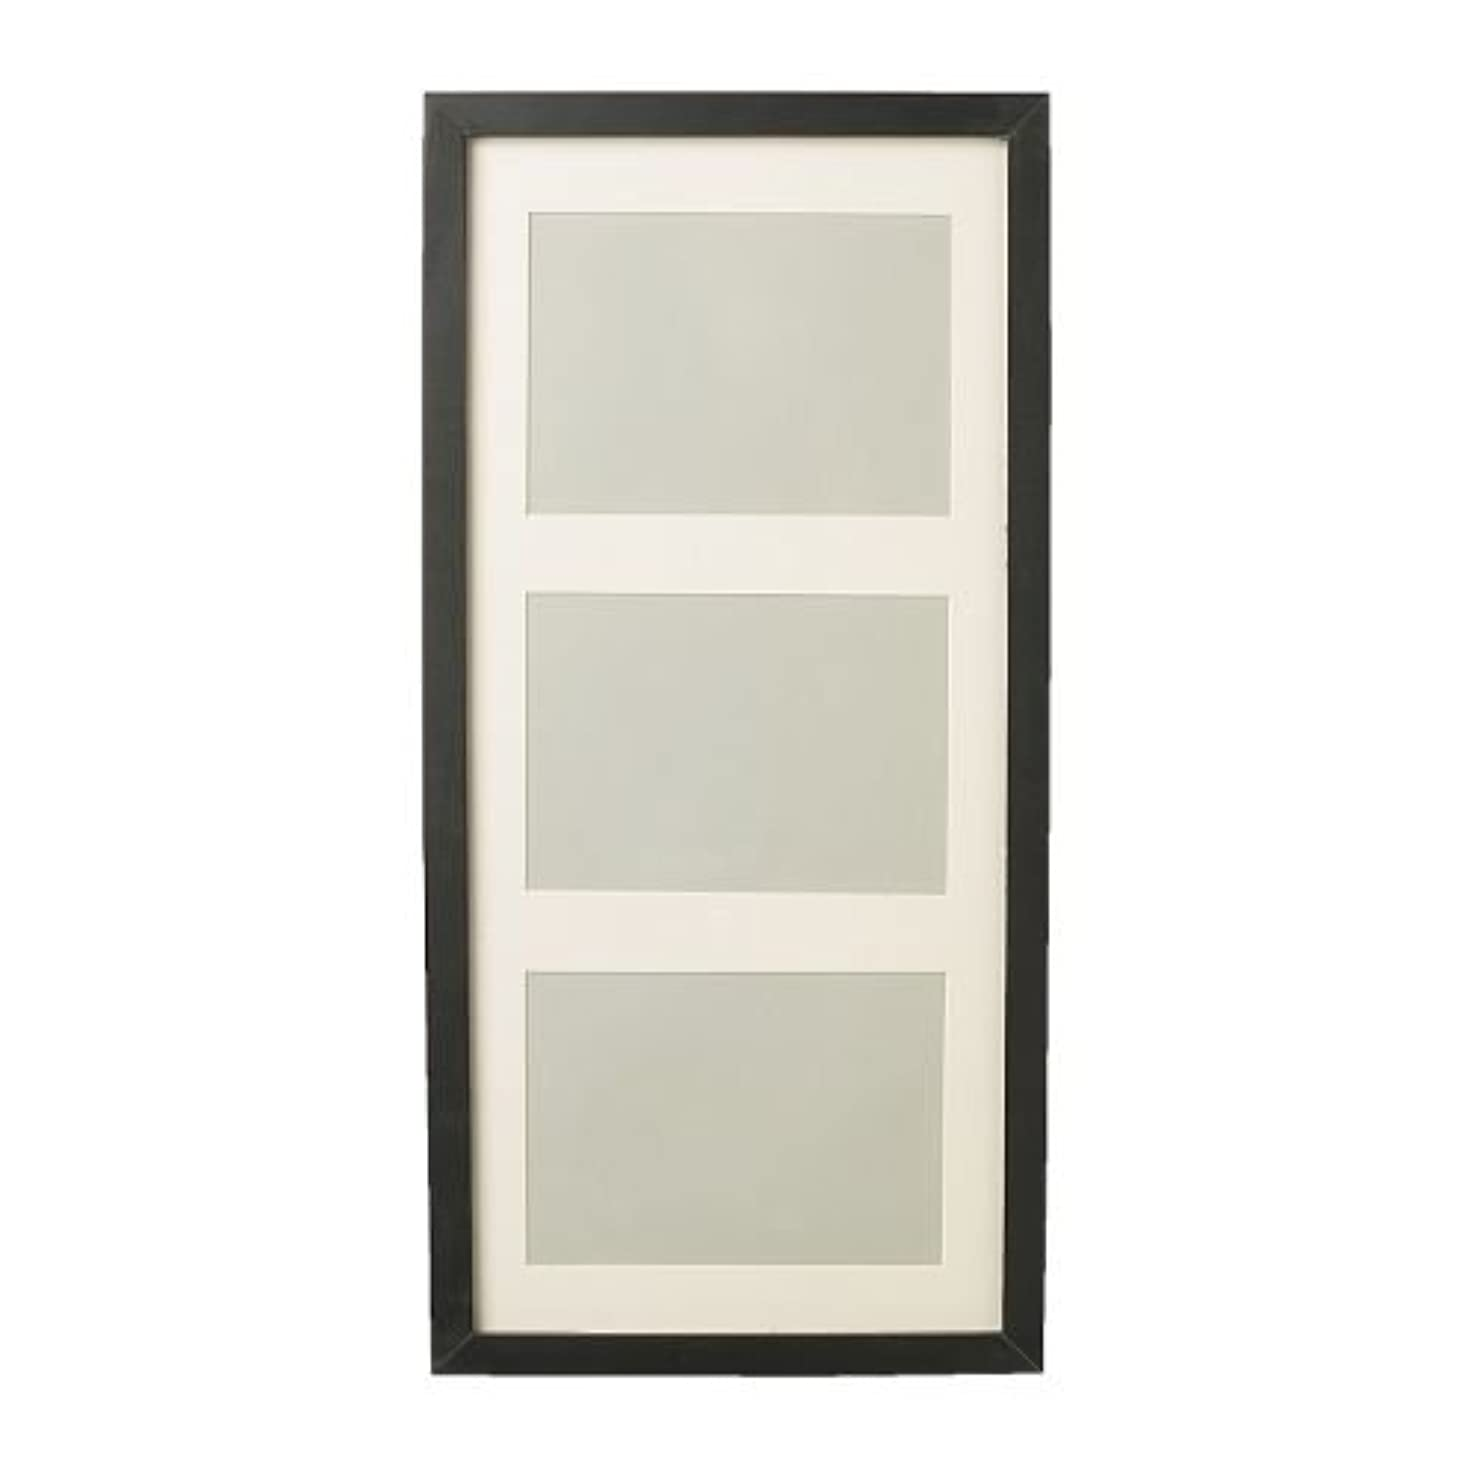 Ikea Frame, black 19 ?x9